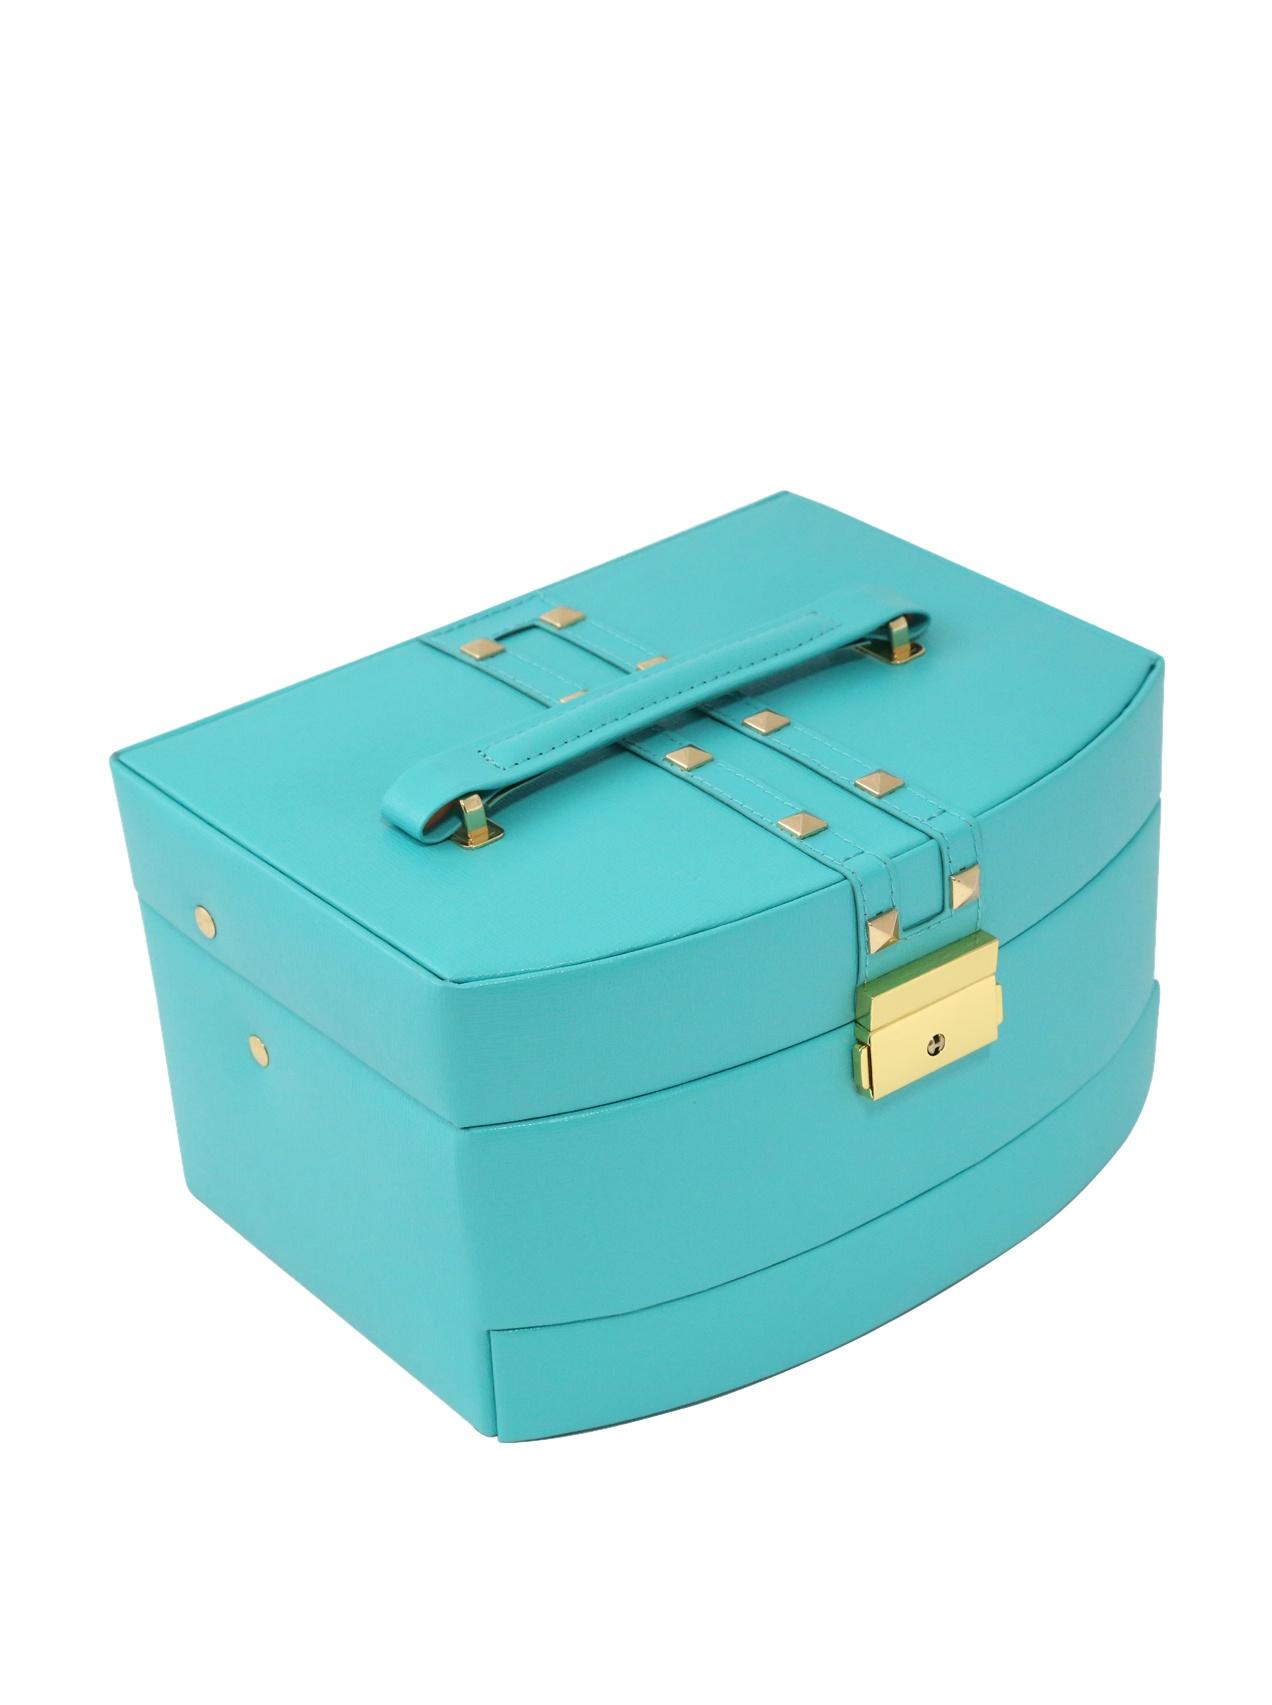 Bey-Berk International 3-Level Hinged Leather Jewelry Box, Turquoise by Bey-Berk International Inc